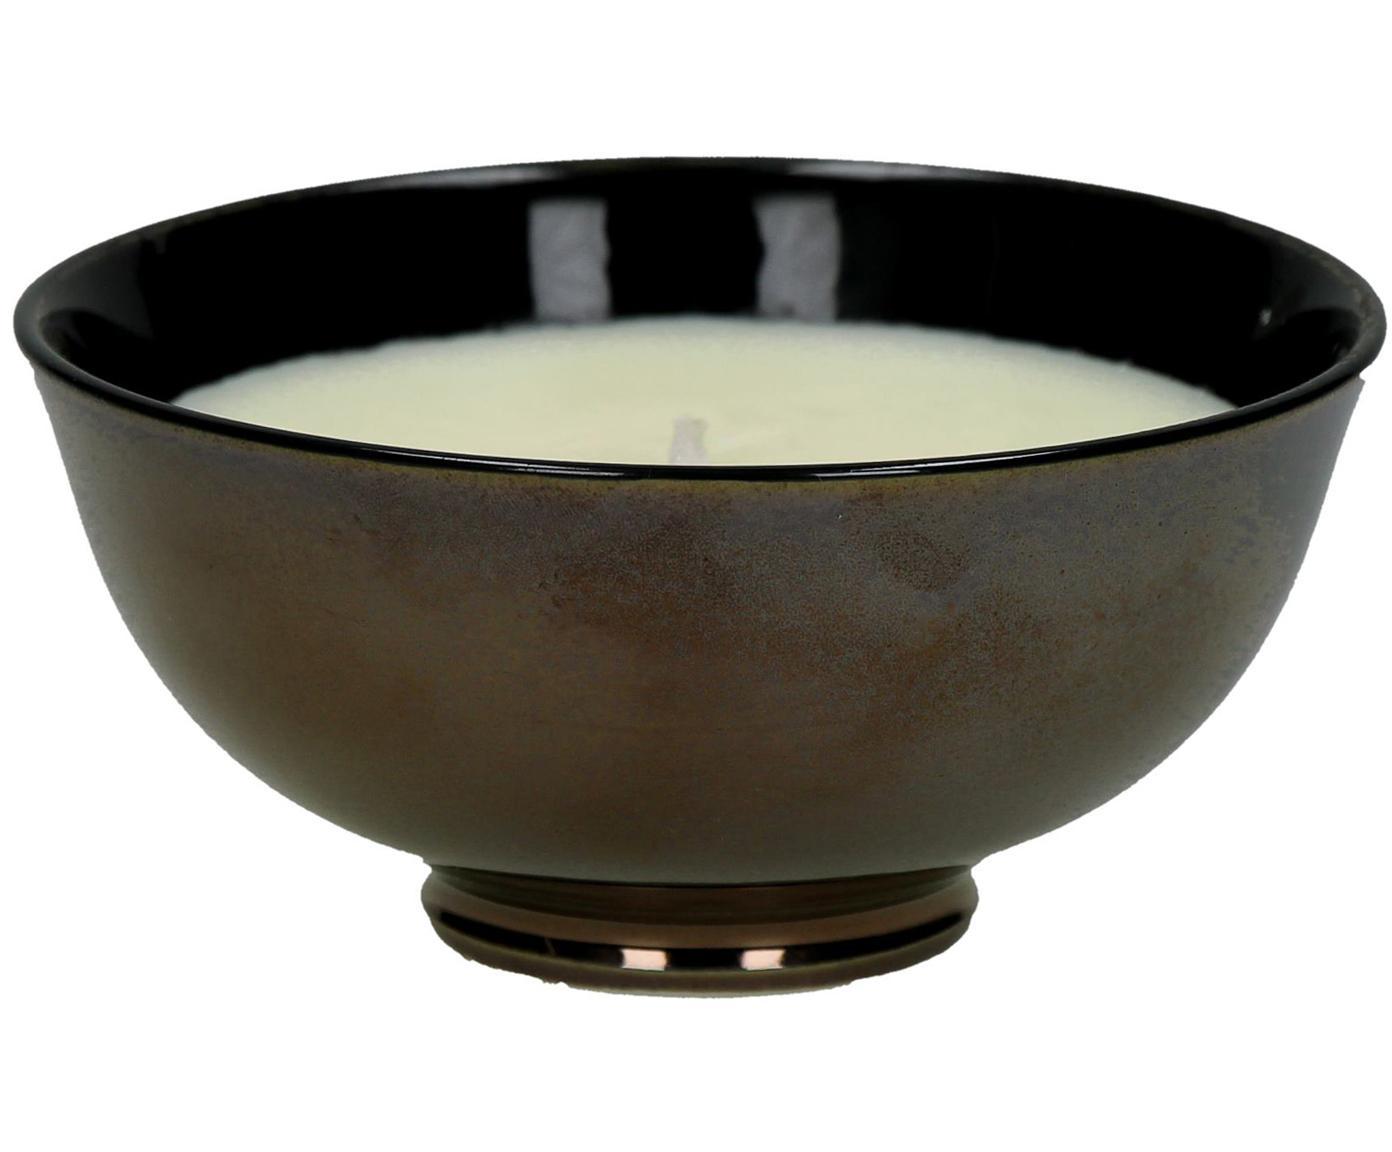 Geurkaars Black Yasmin (jasmijn), Houder: porselein, Houder: bruin.  Kaars: wit, Ø 12 x H 6 cm